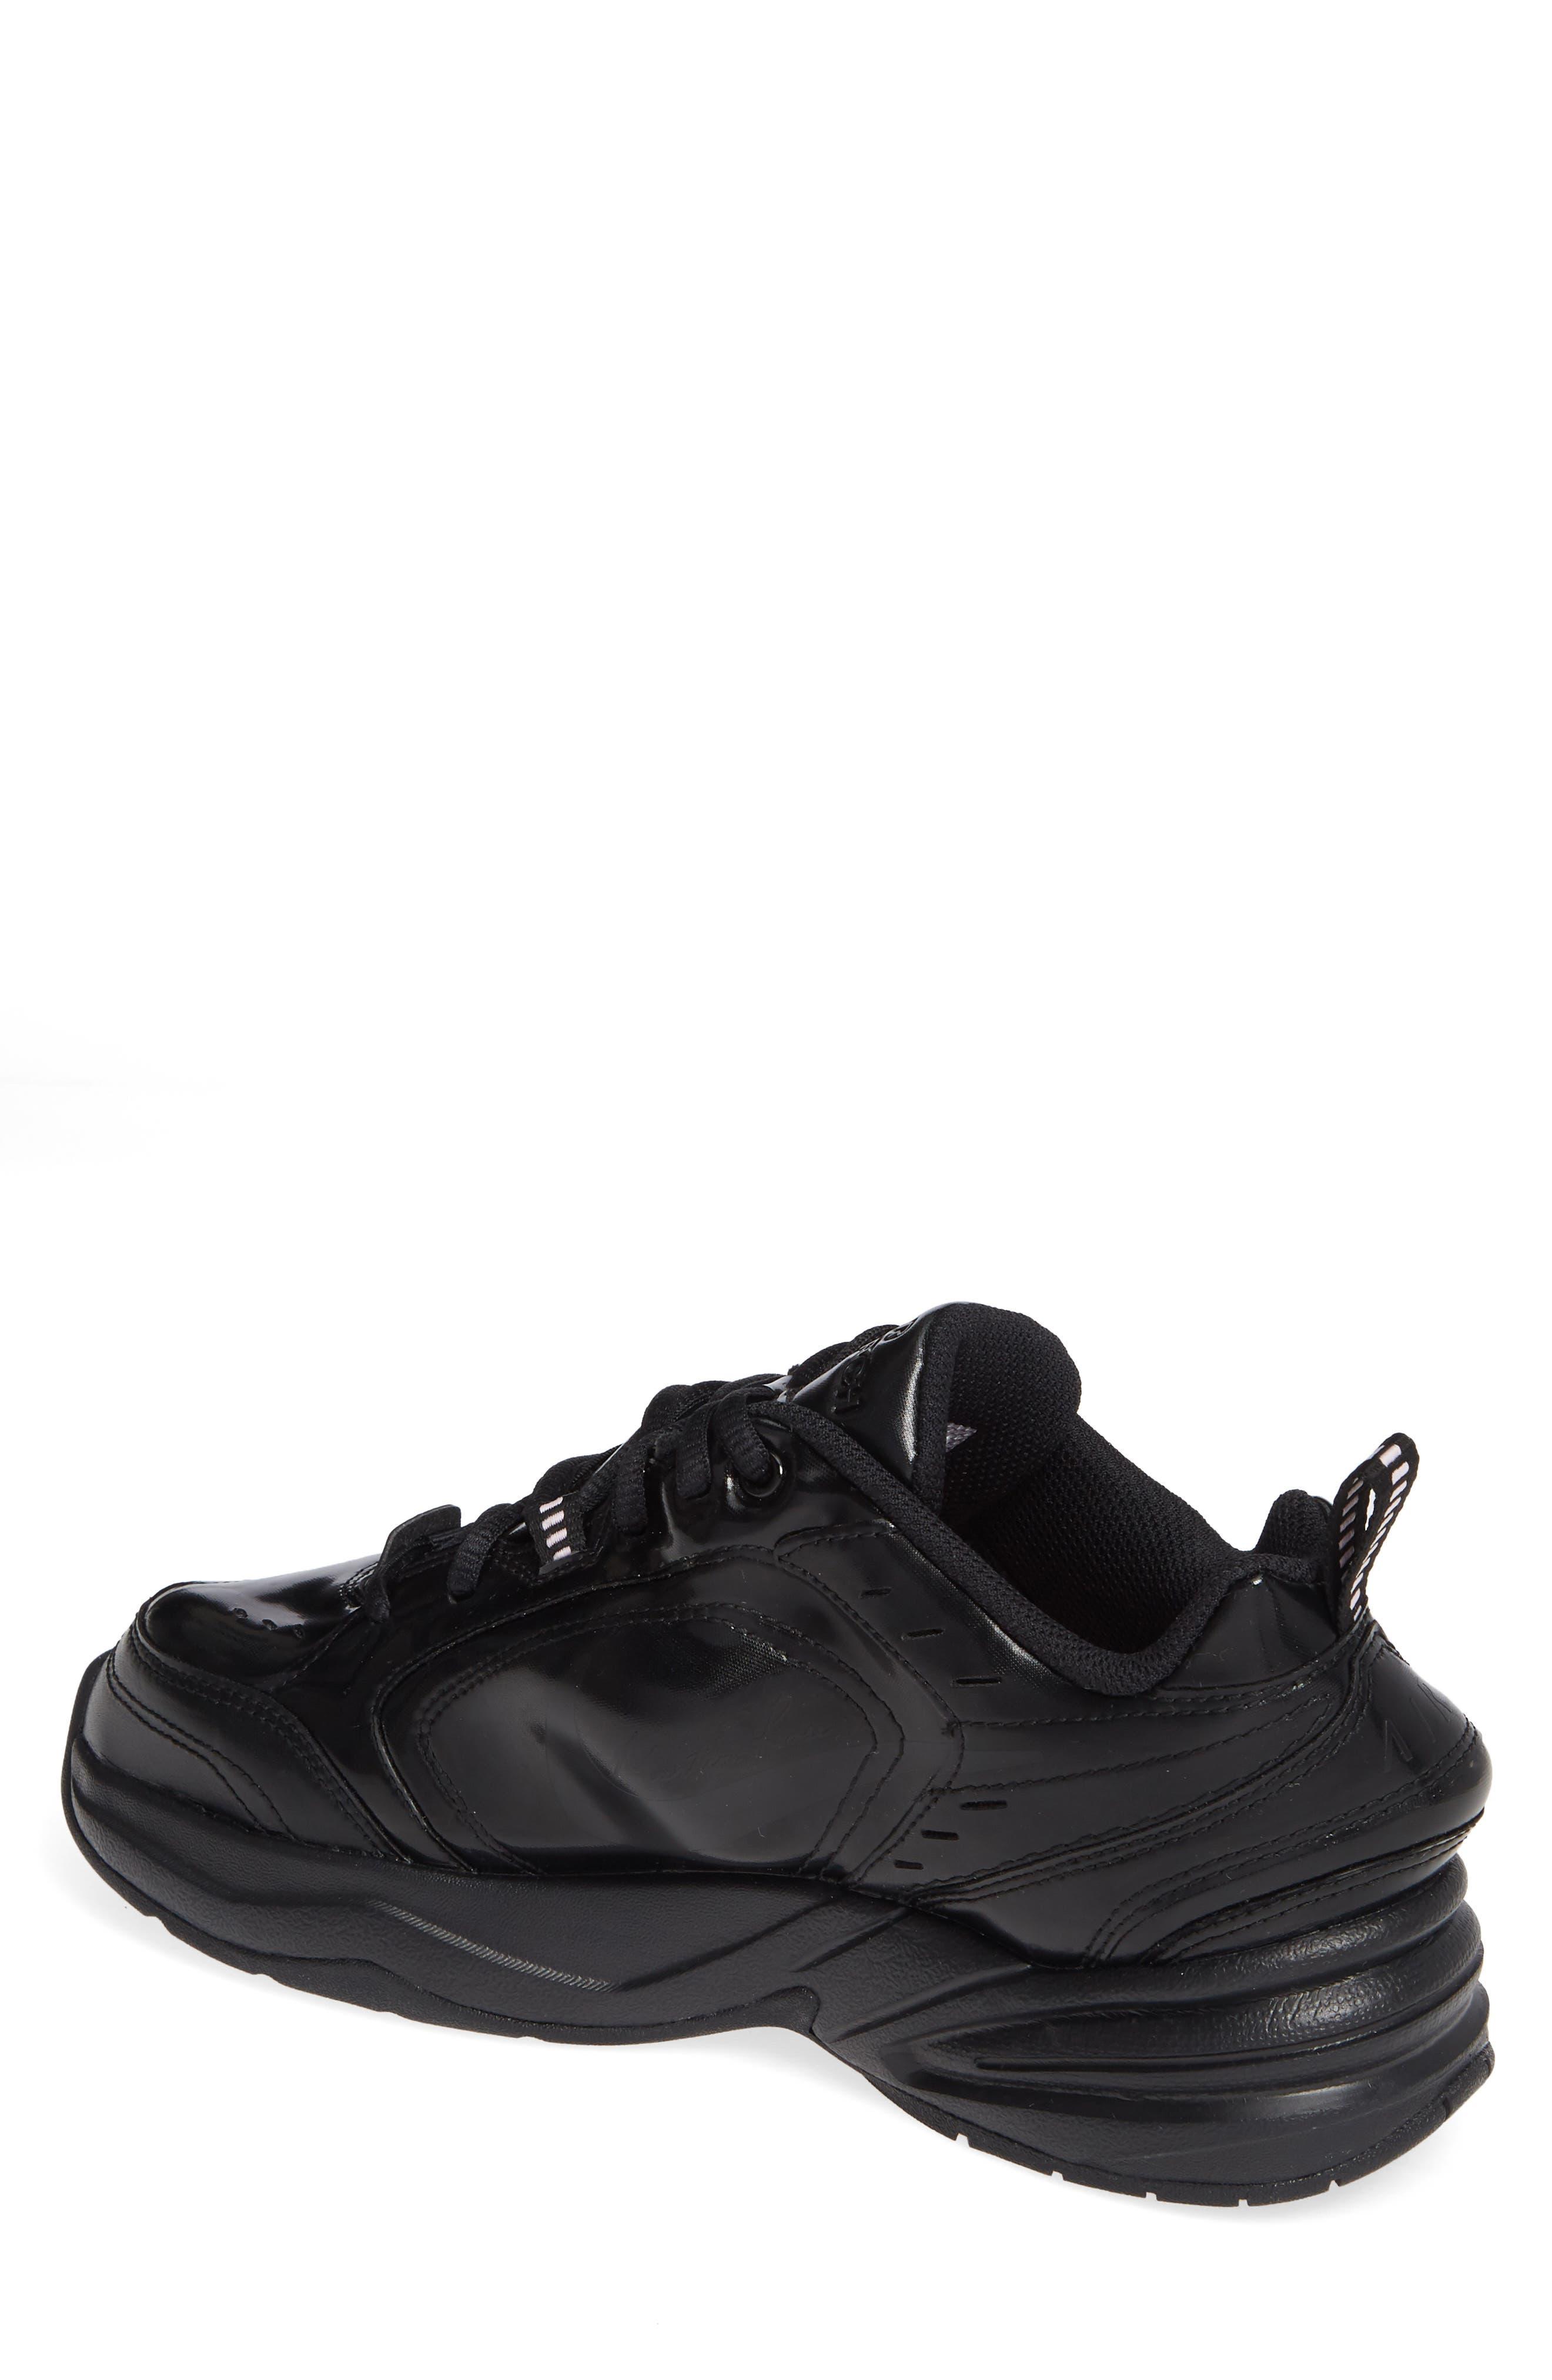 x Martine Rose Air Monarch IV Sneaker,                             Alternate thumbnail 2, color,                             BLACK/ SOFT PINK